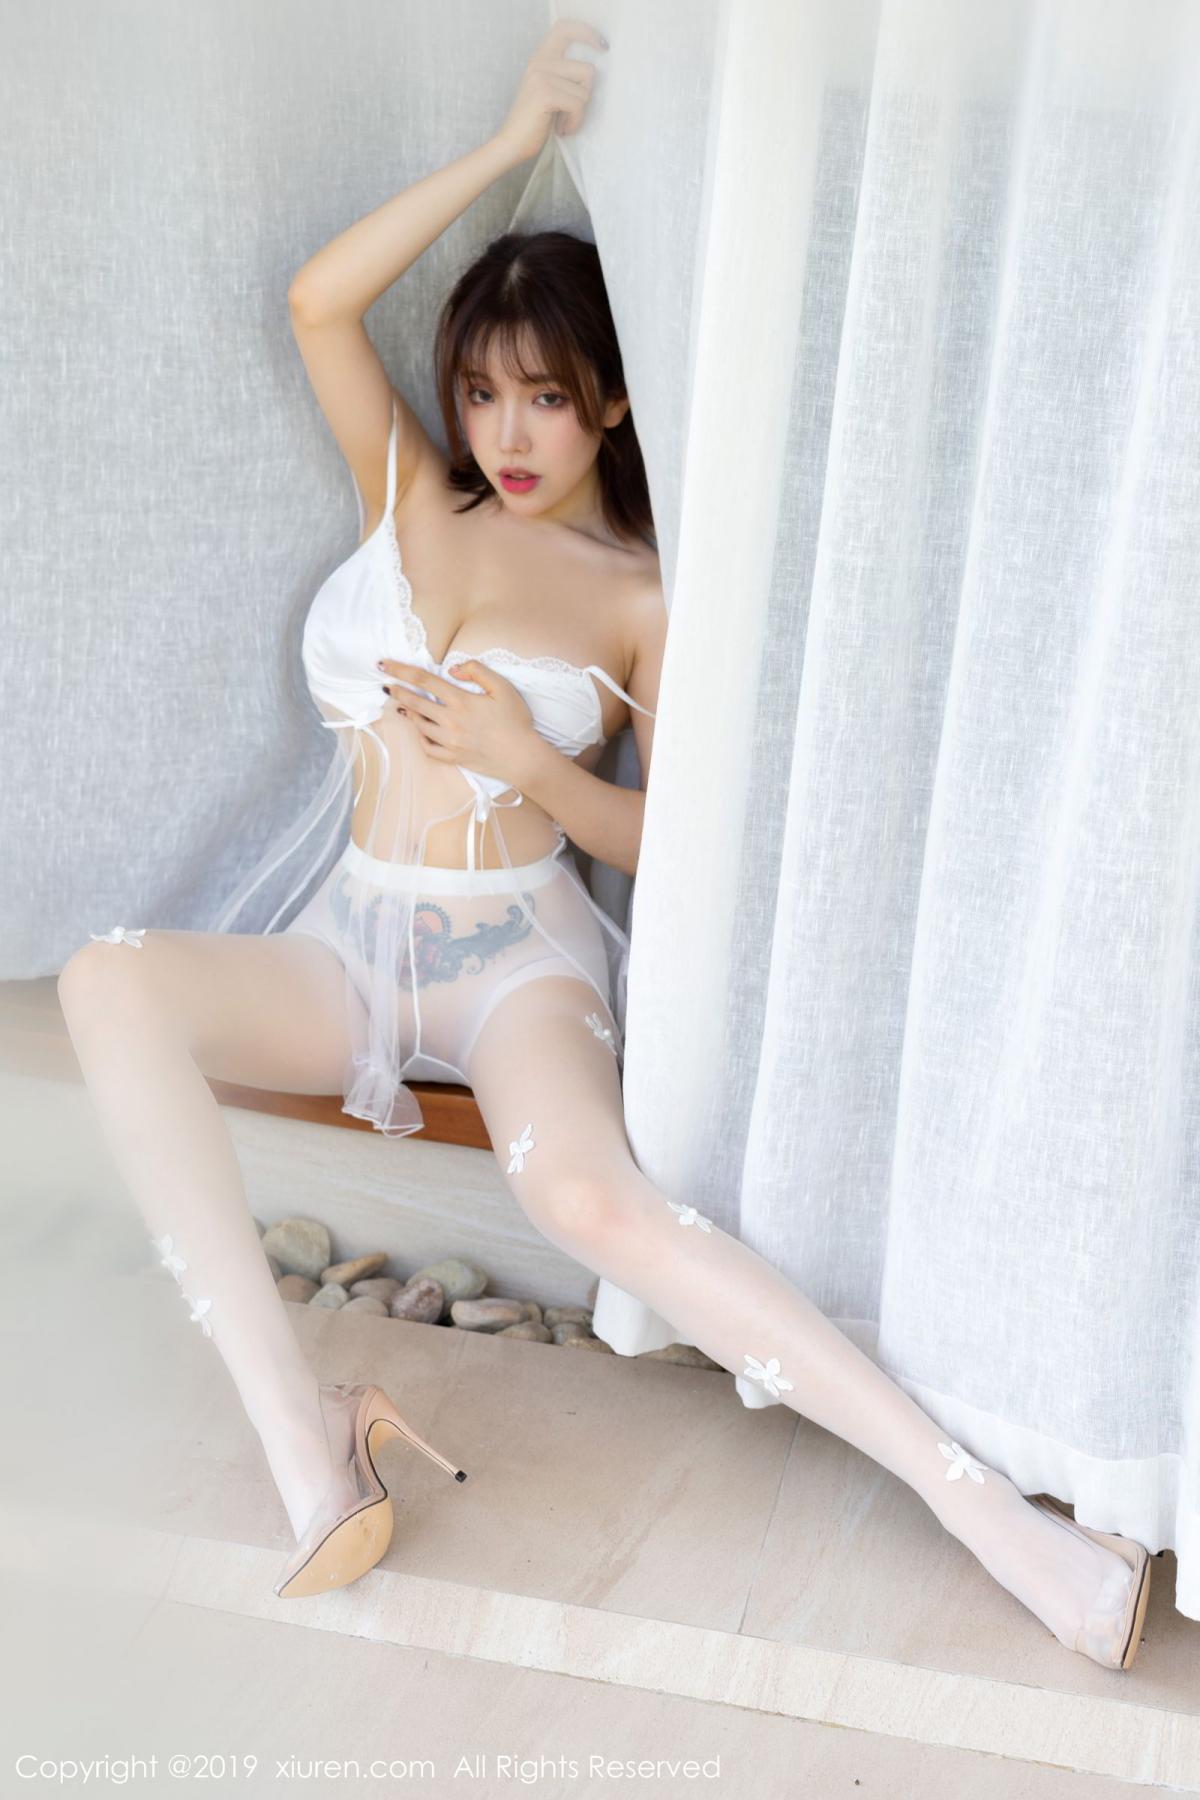 [XiuRen] Vol.1578 Huang Le Ran 25P, Huang Le Ran, Underwear, Xiuren